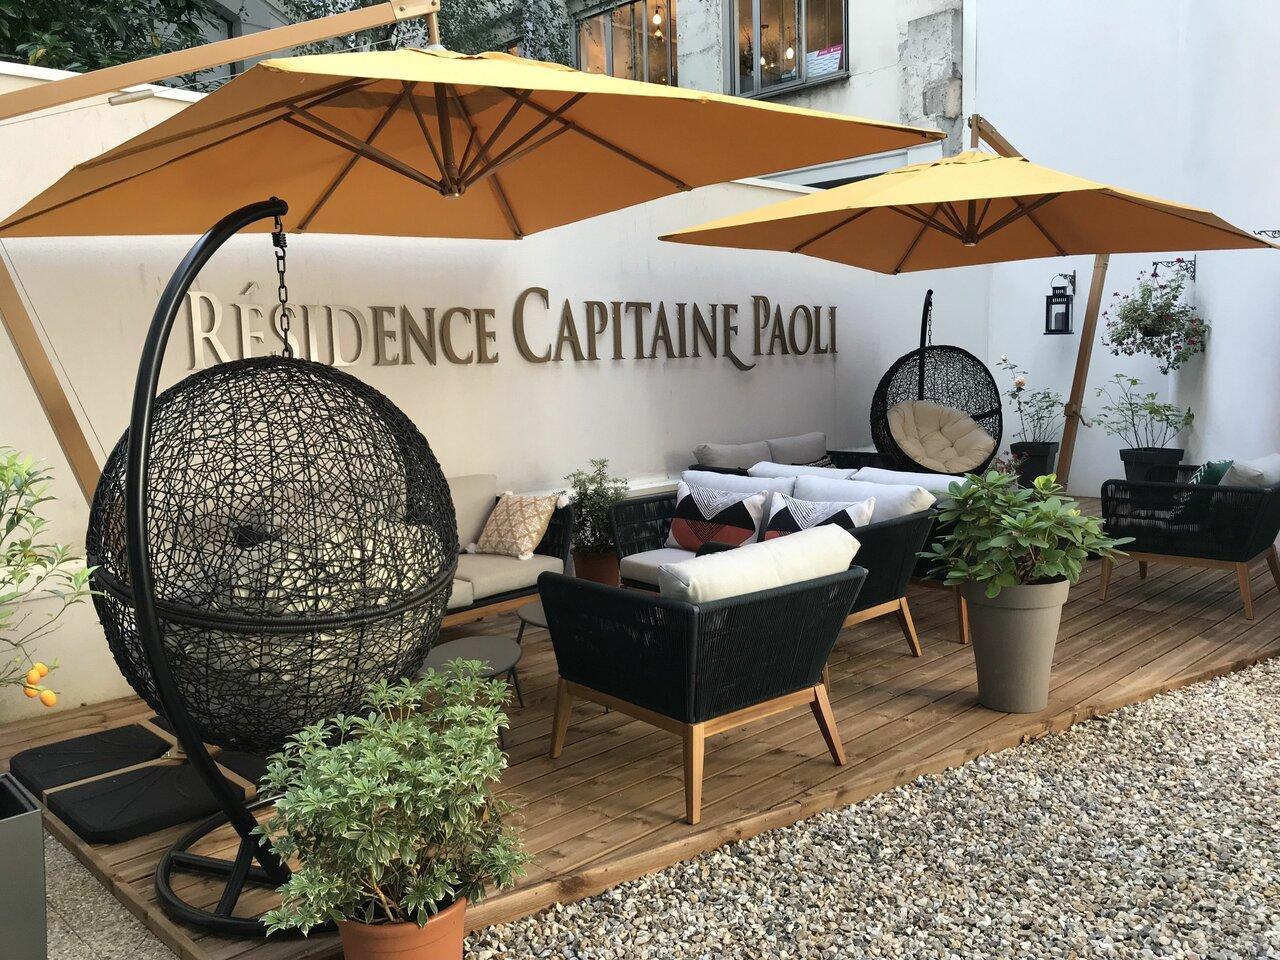 Residence Capitaine Paoli